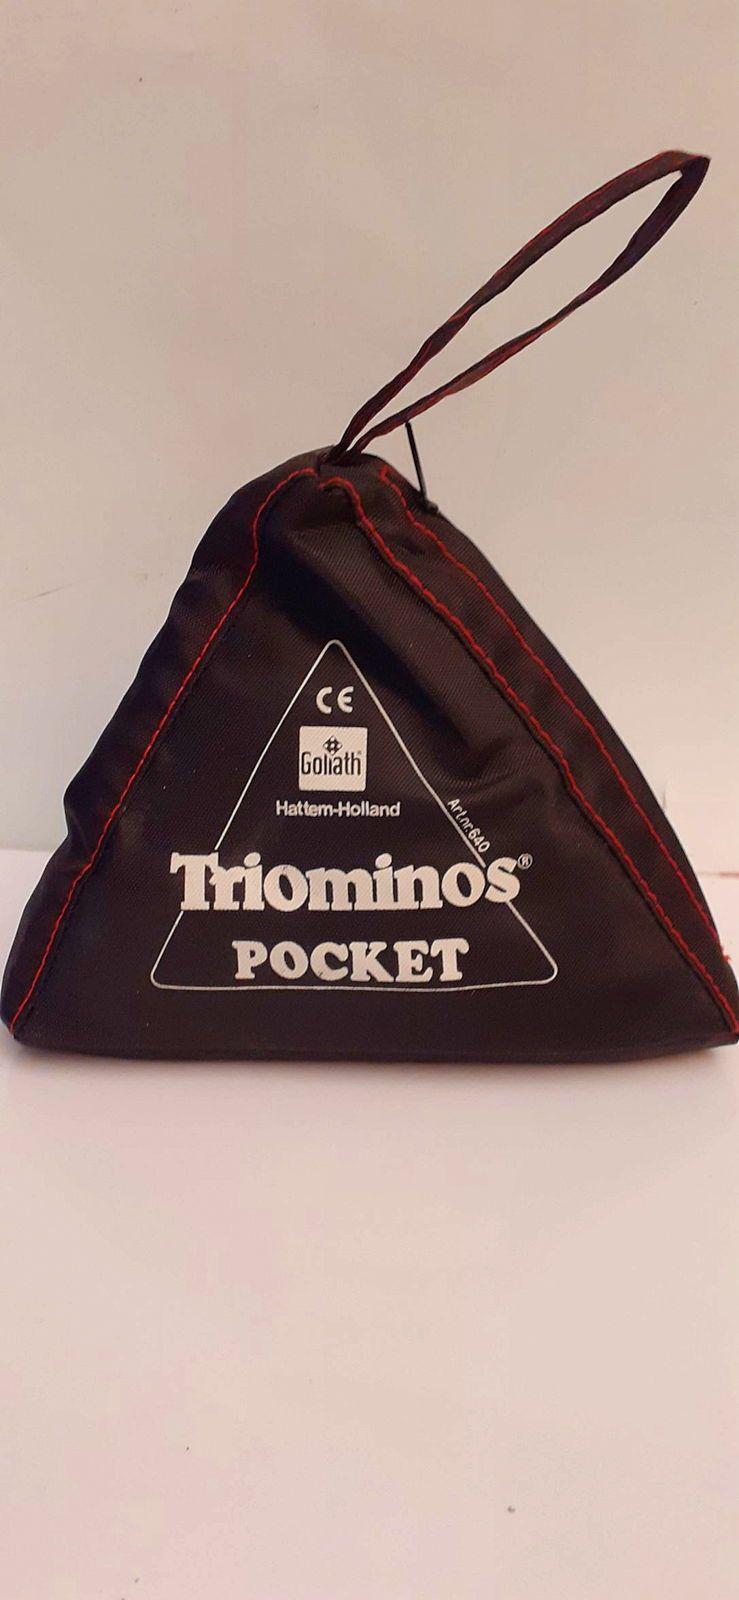 Triomino pocket